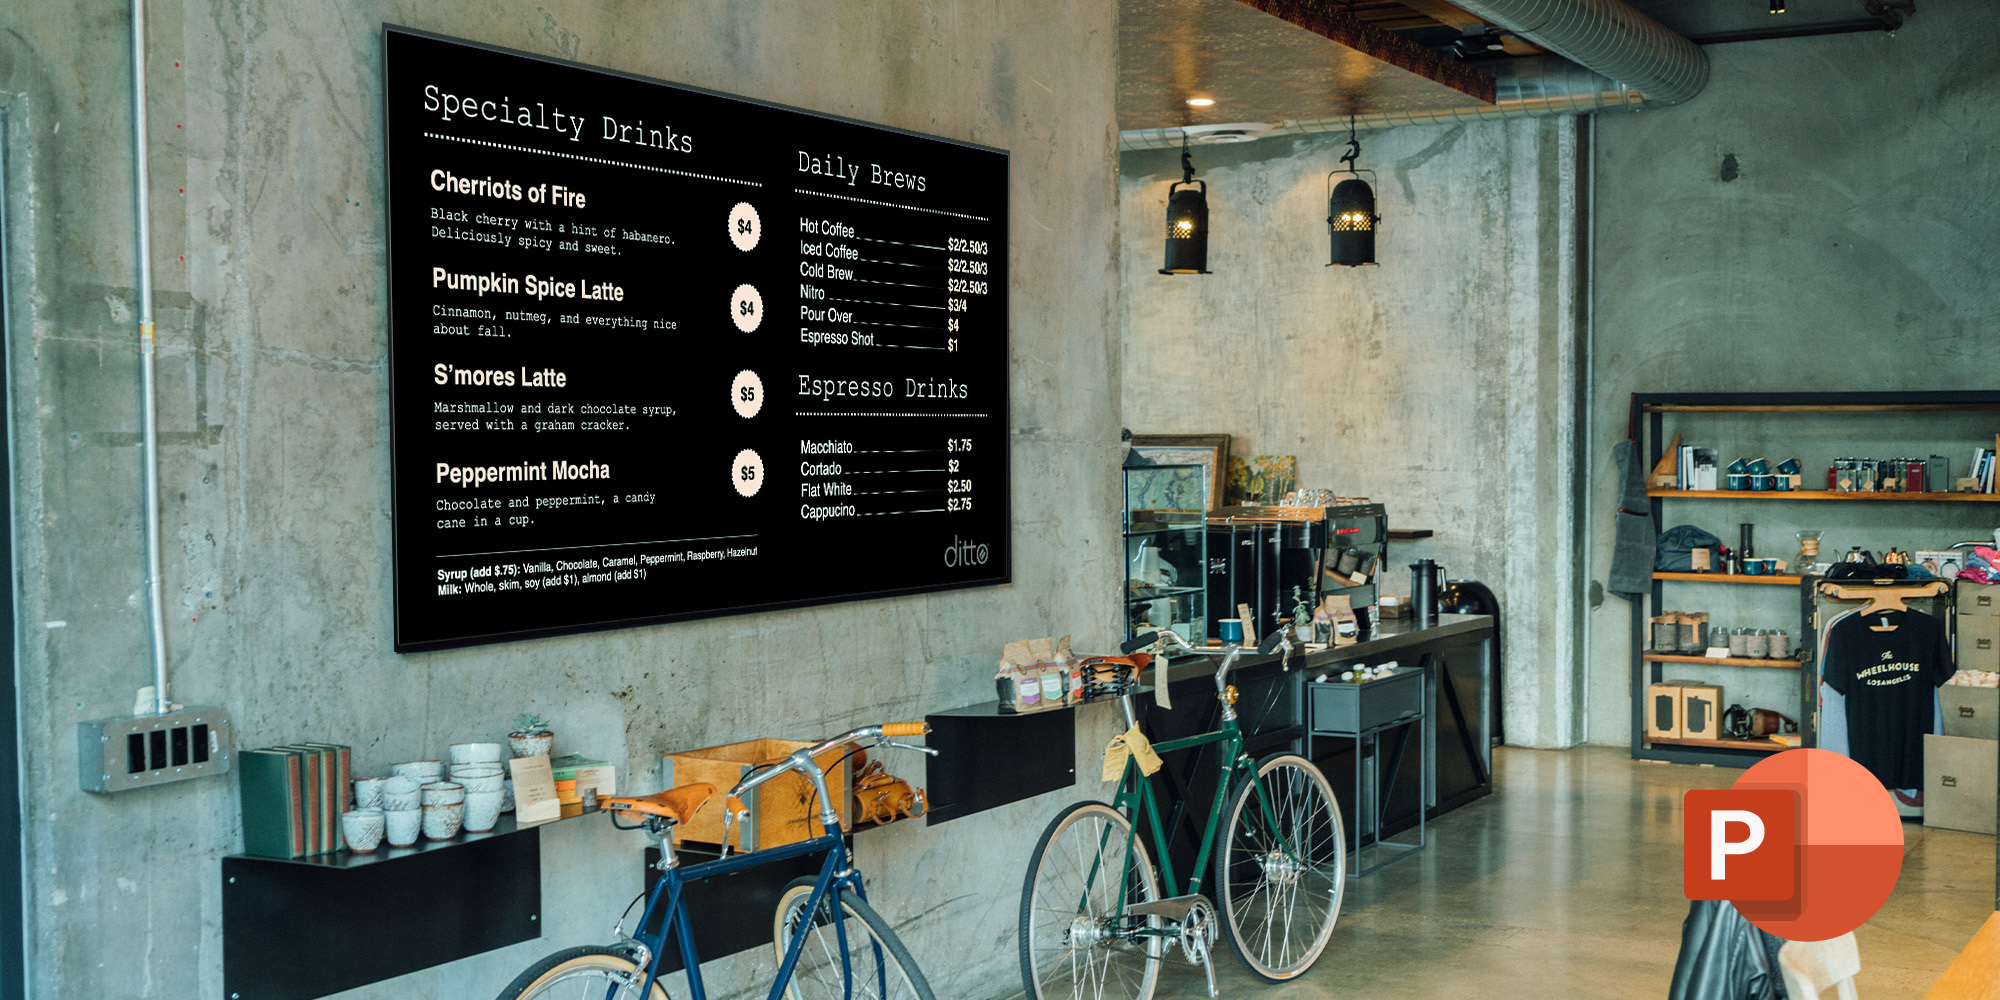 Digital menu boards from Microsoft PowerPoint